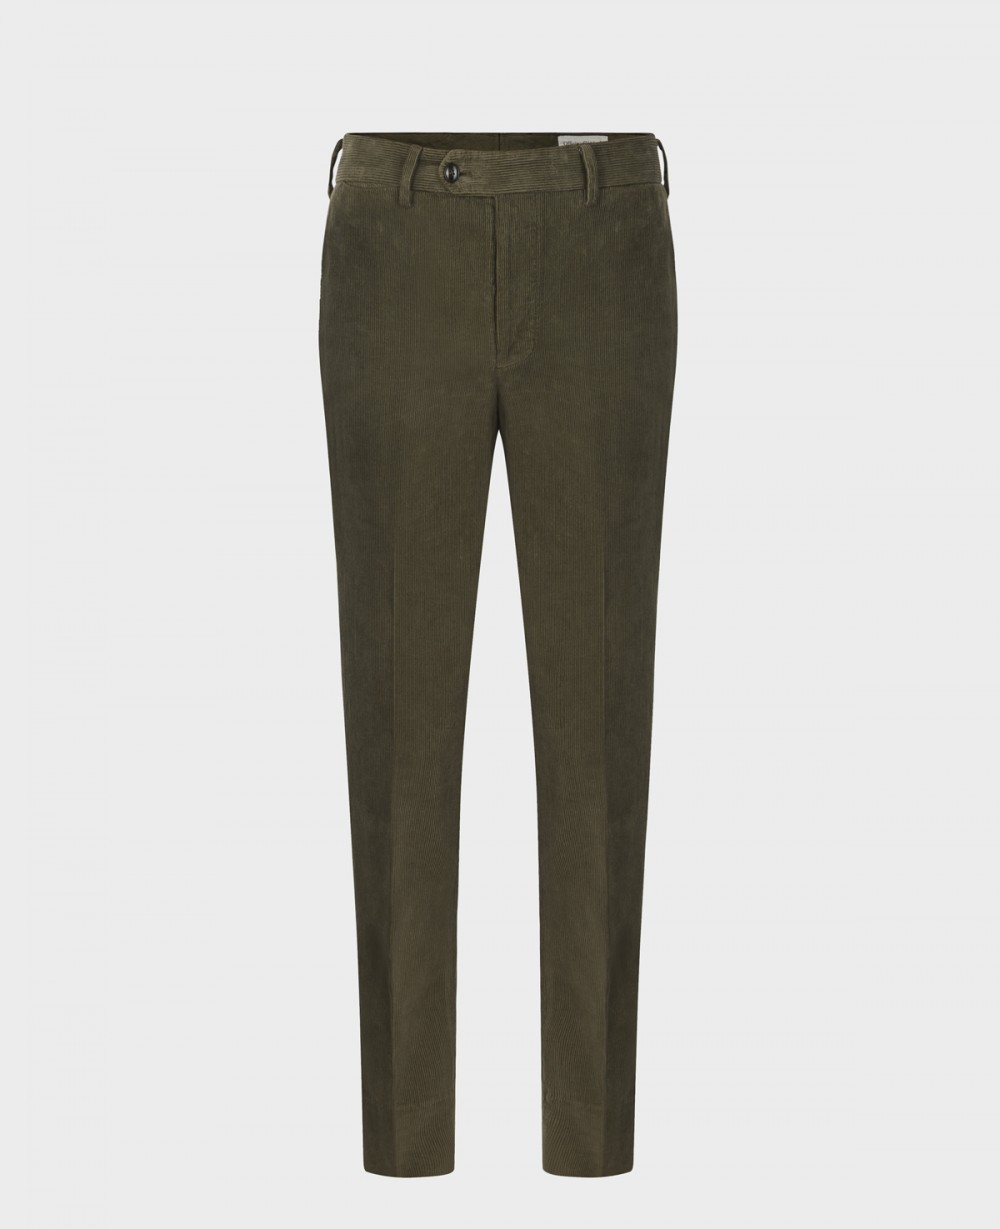 pantalon-paul-velours-anglais.jpg